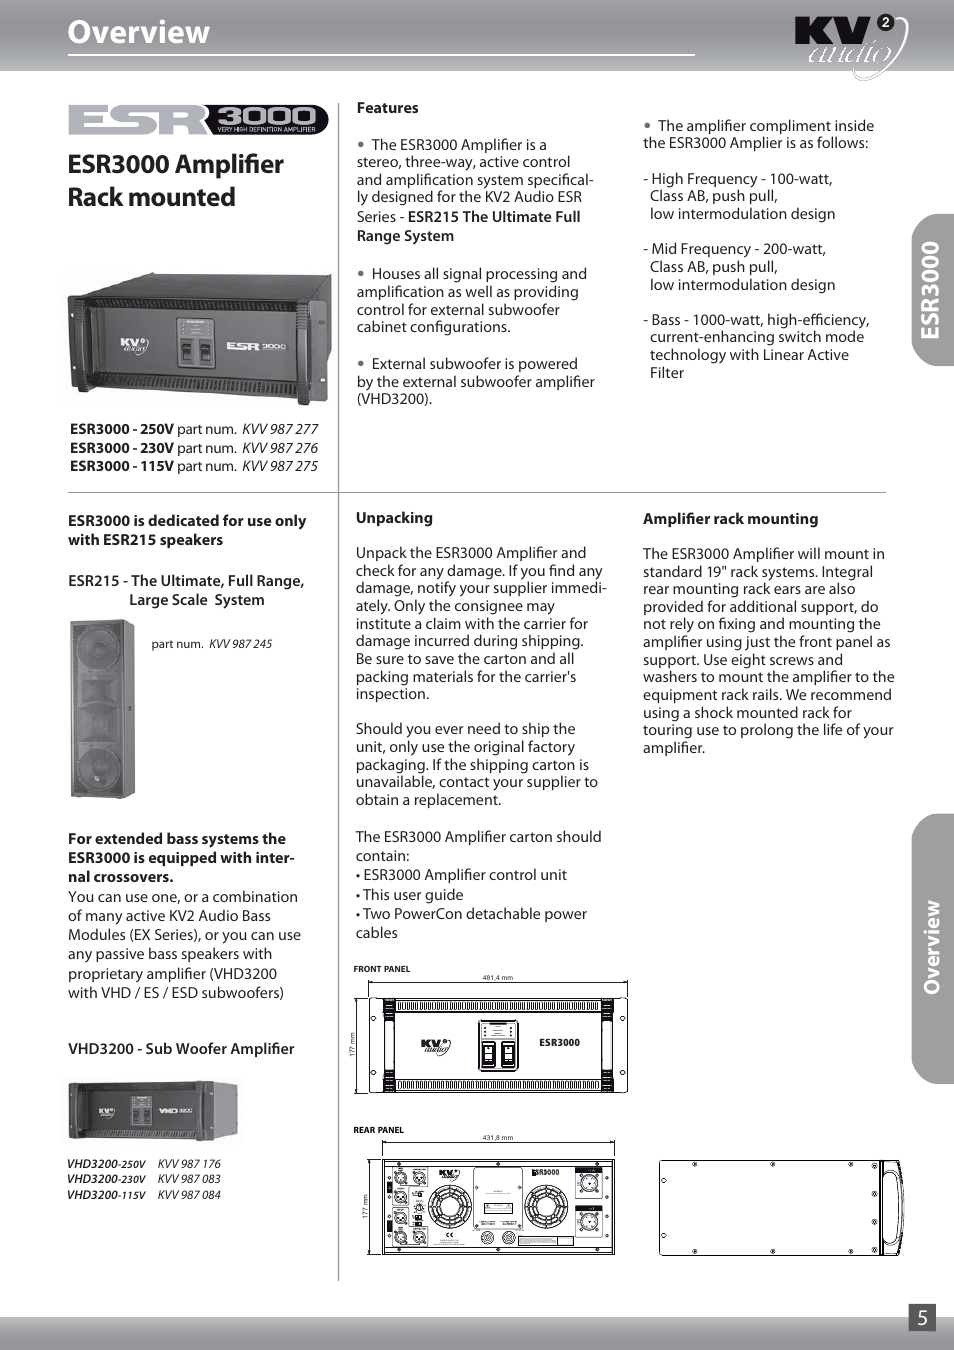 Overview, Esr3000 amplifier rack mounted, Esr3000 | KV2